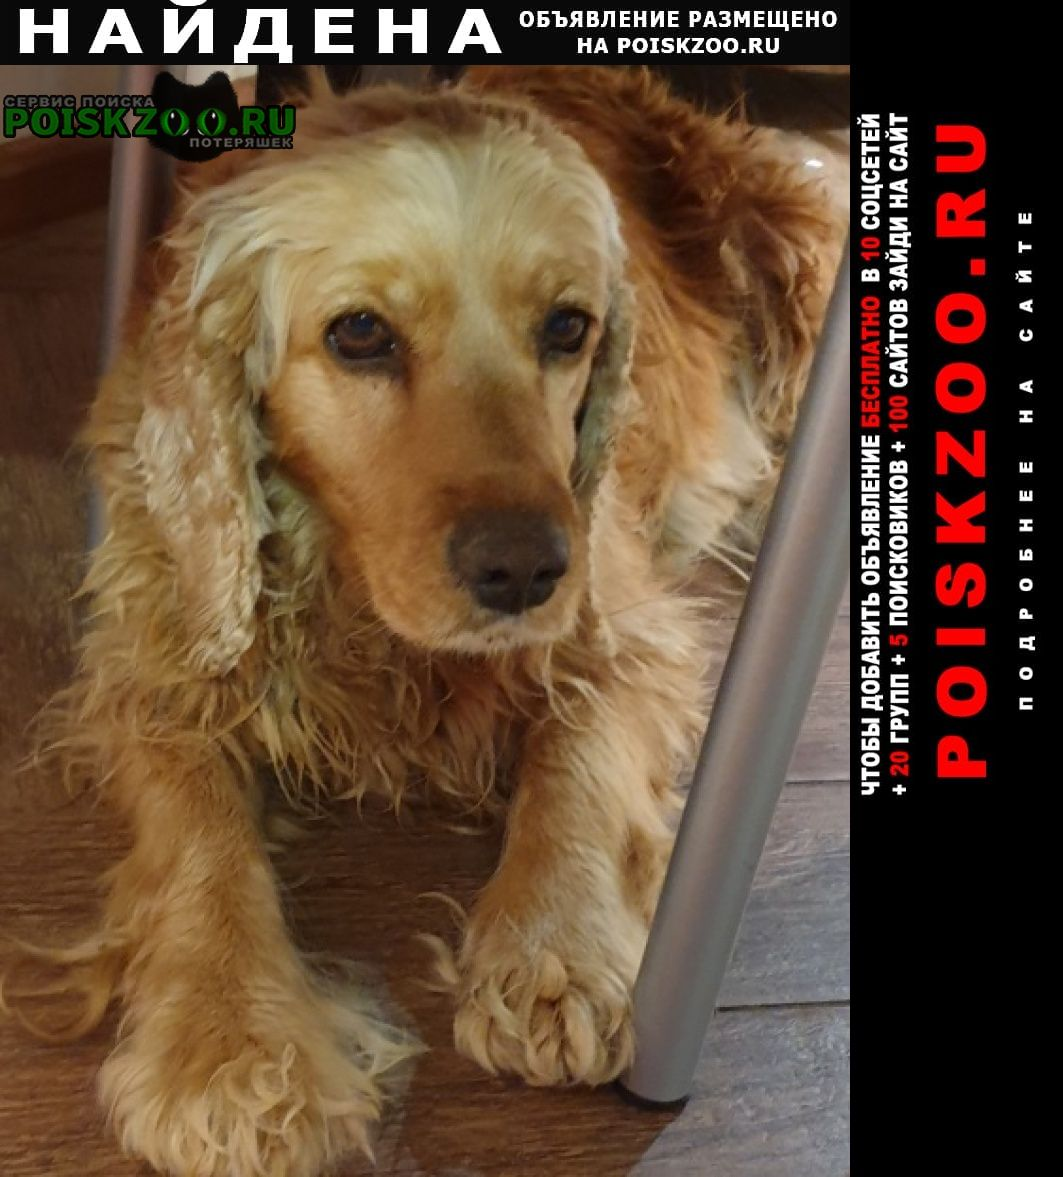 Найдена собака Кропоткин